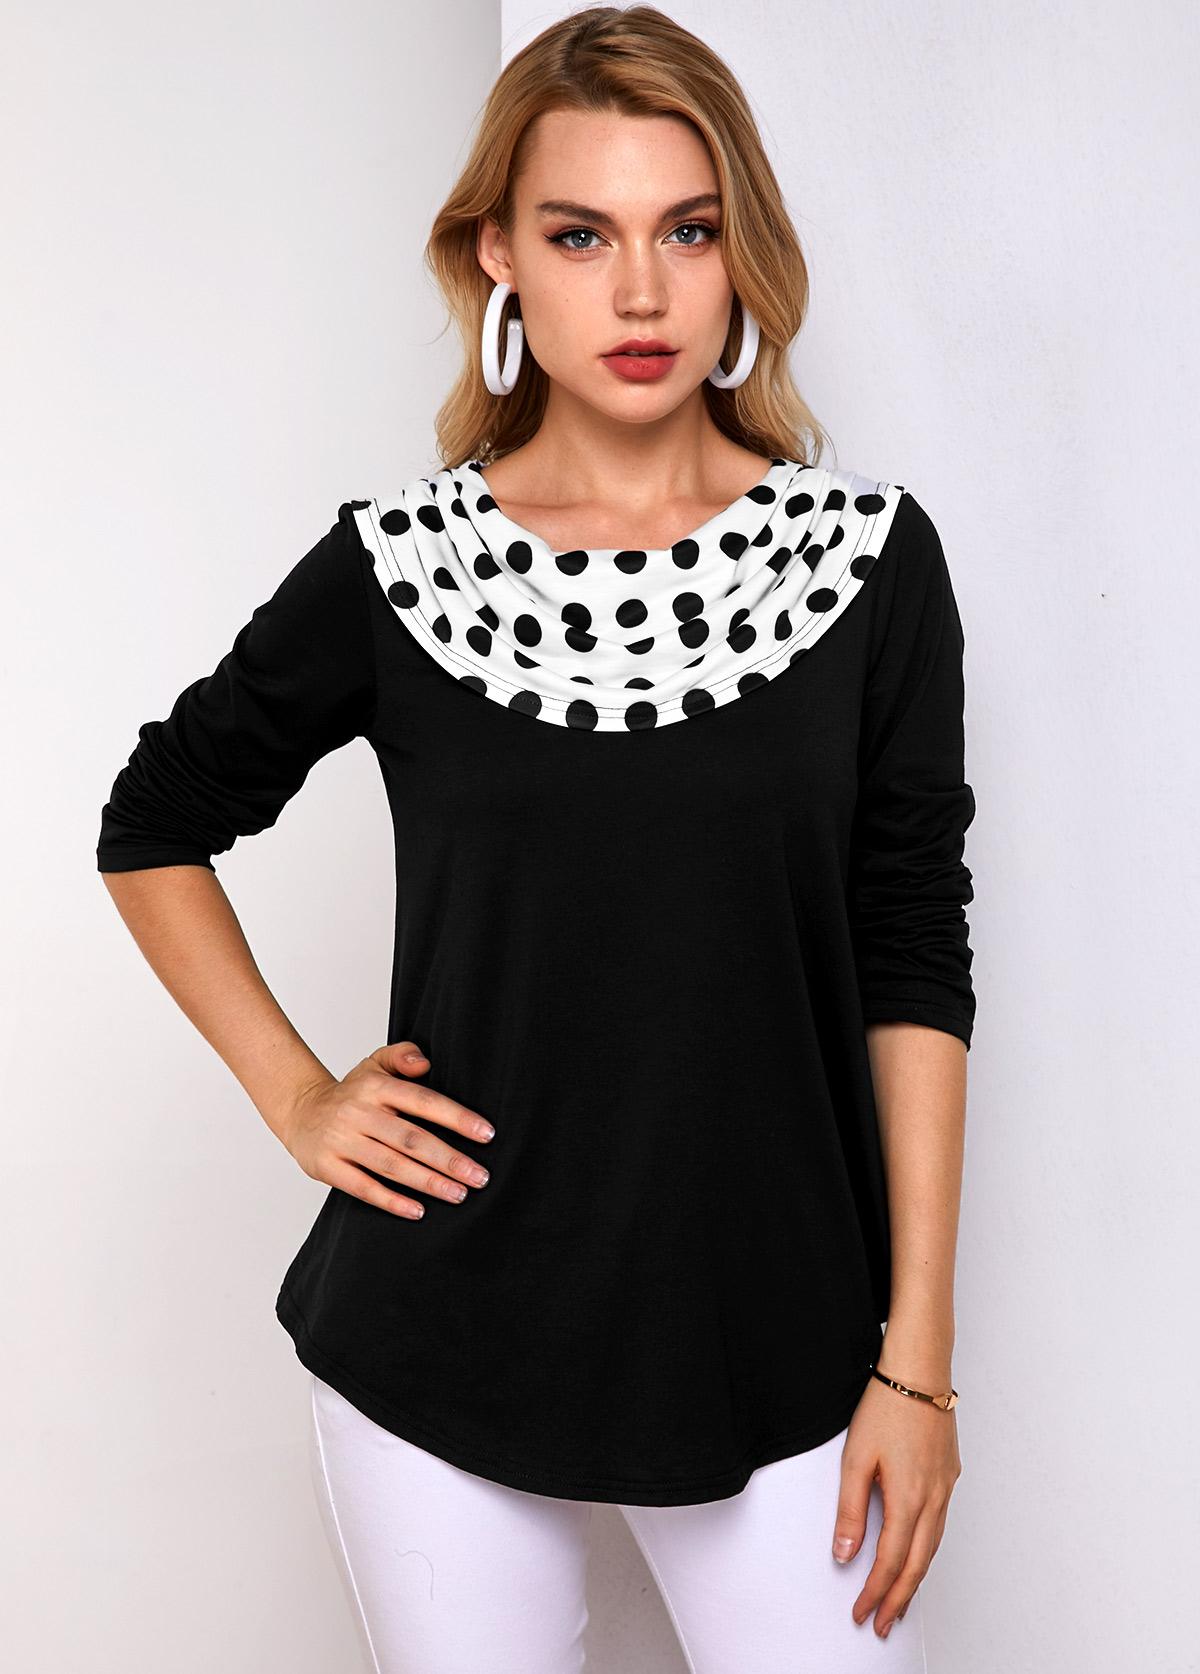 Polka Dot Long Sleeve Black T Shirt